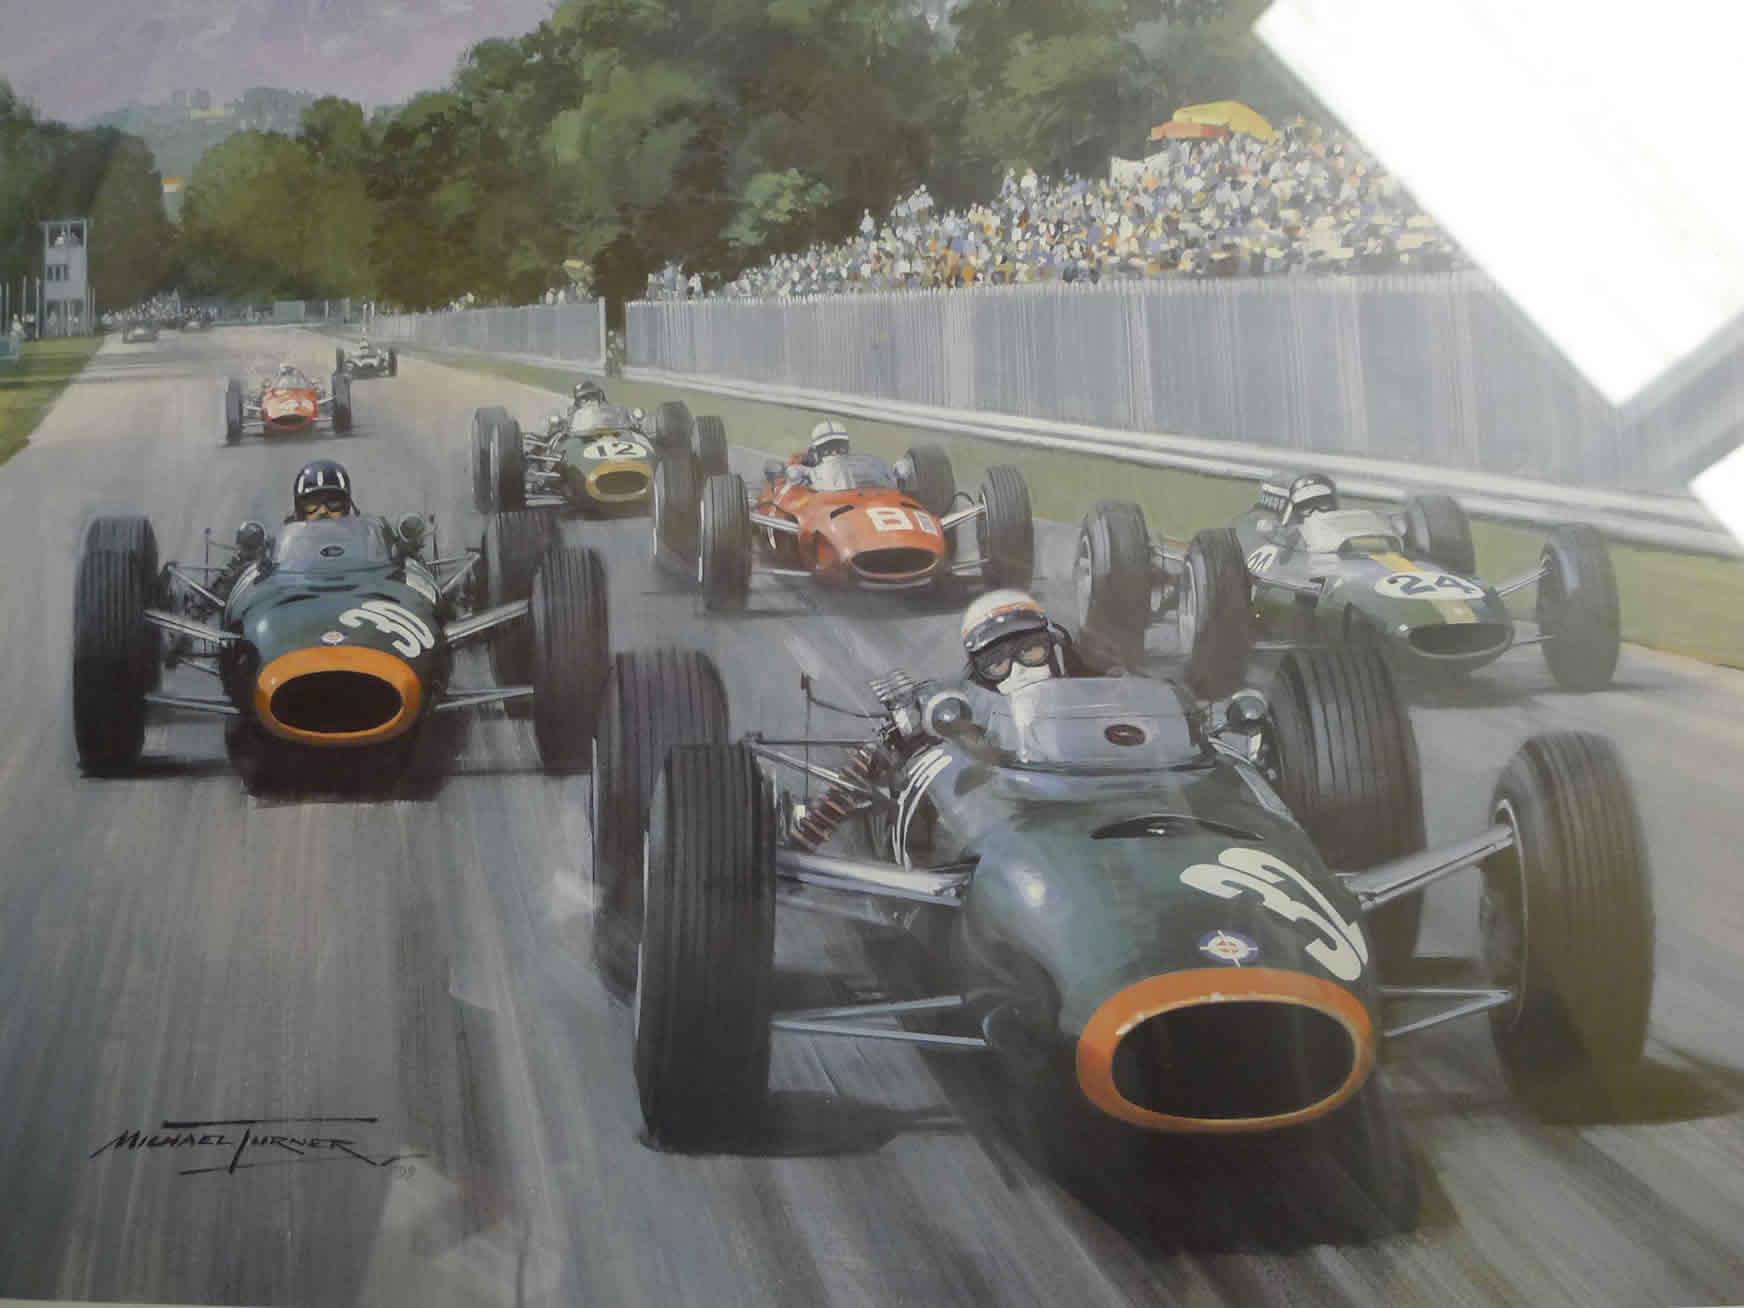 BRM – Set of 7 Michael Turner limited edition prints